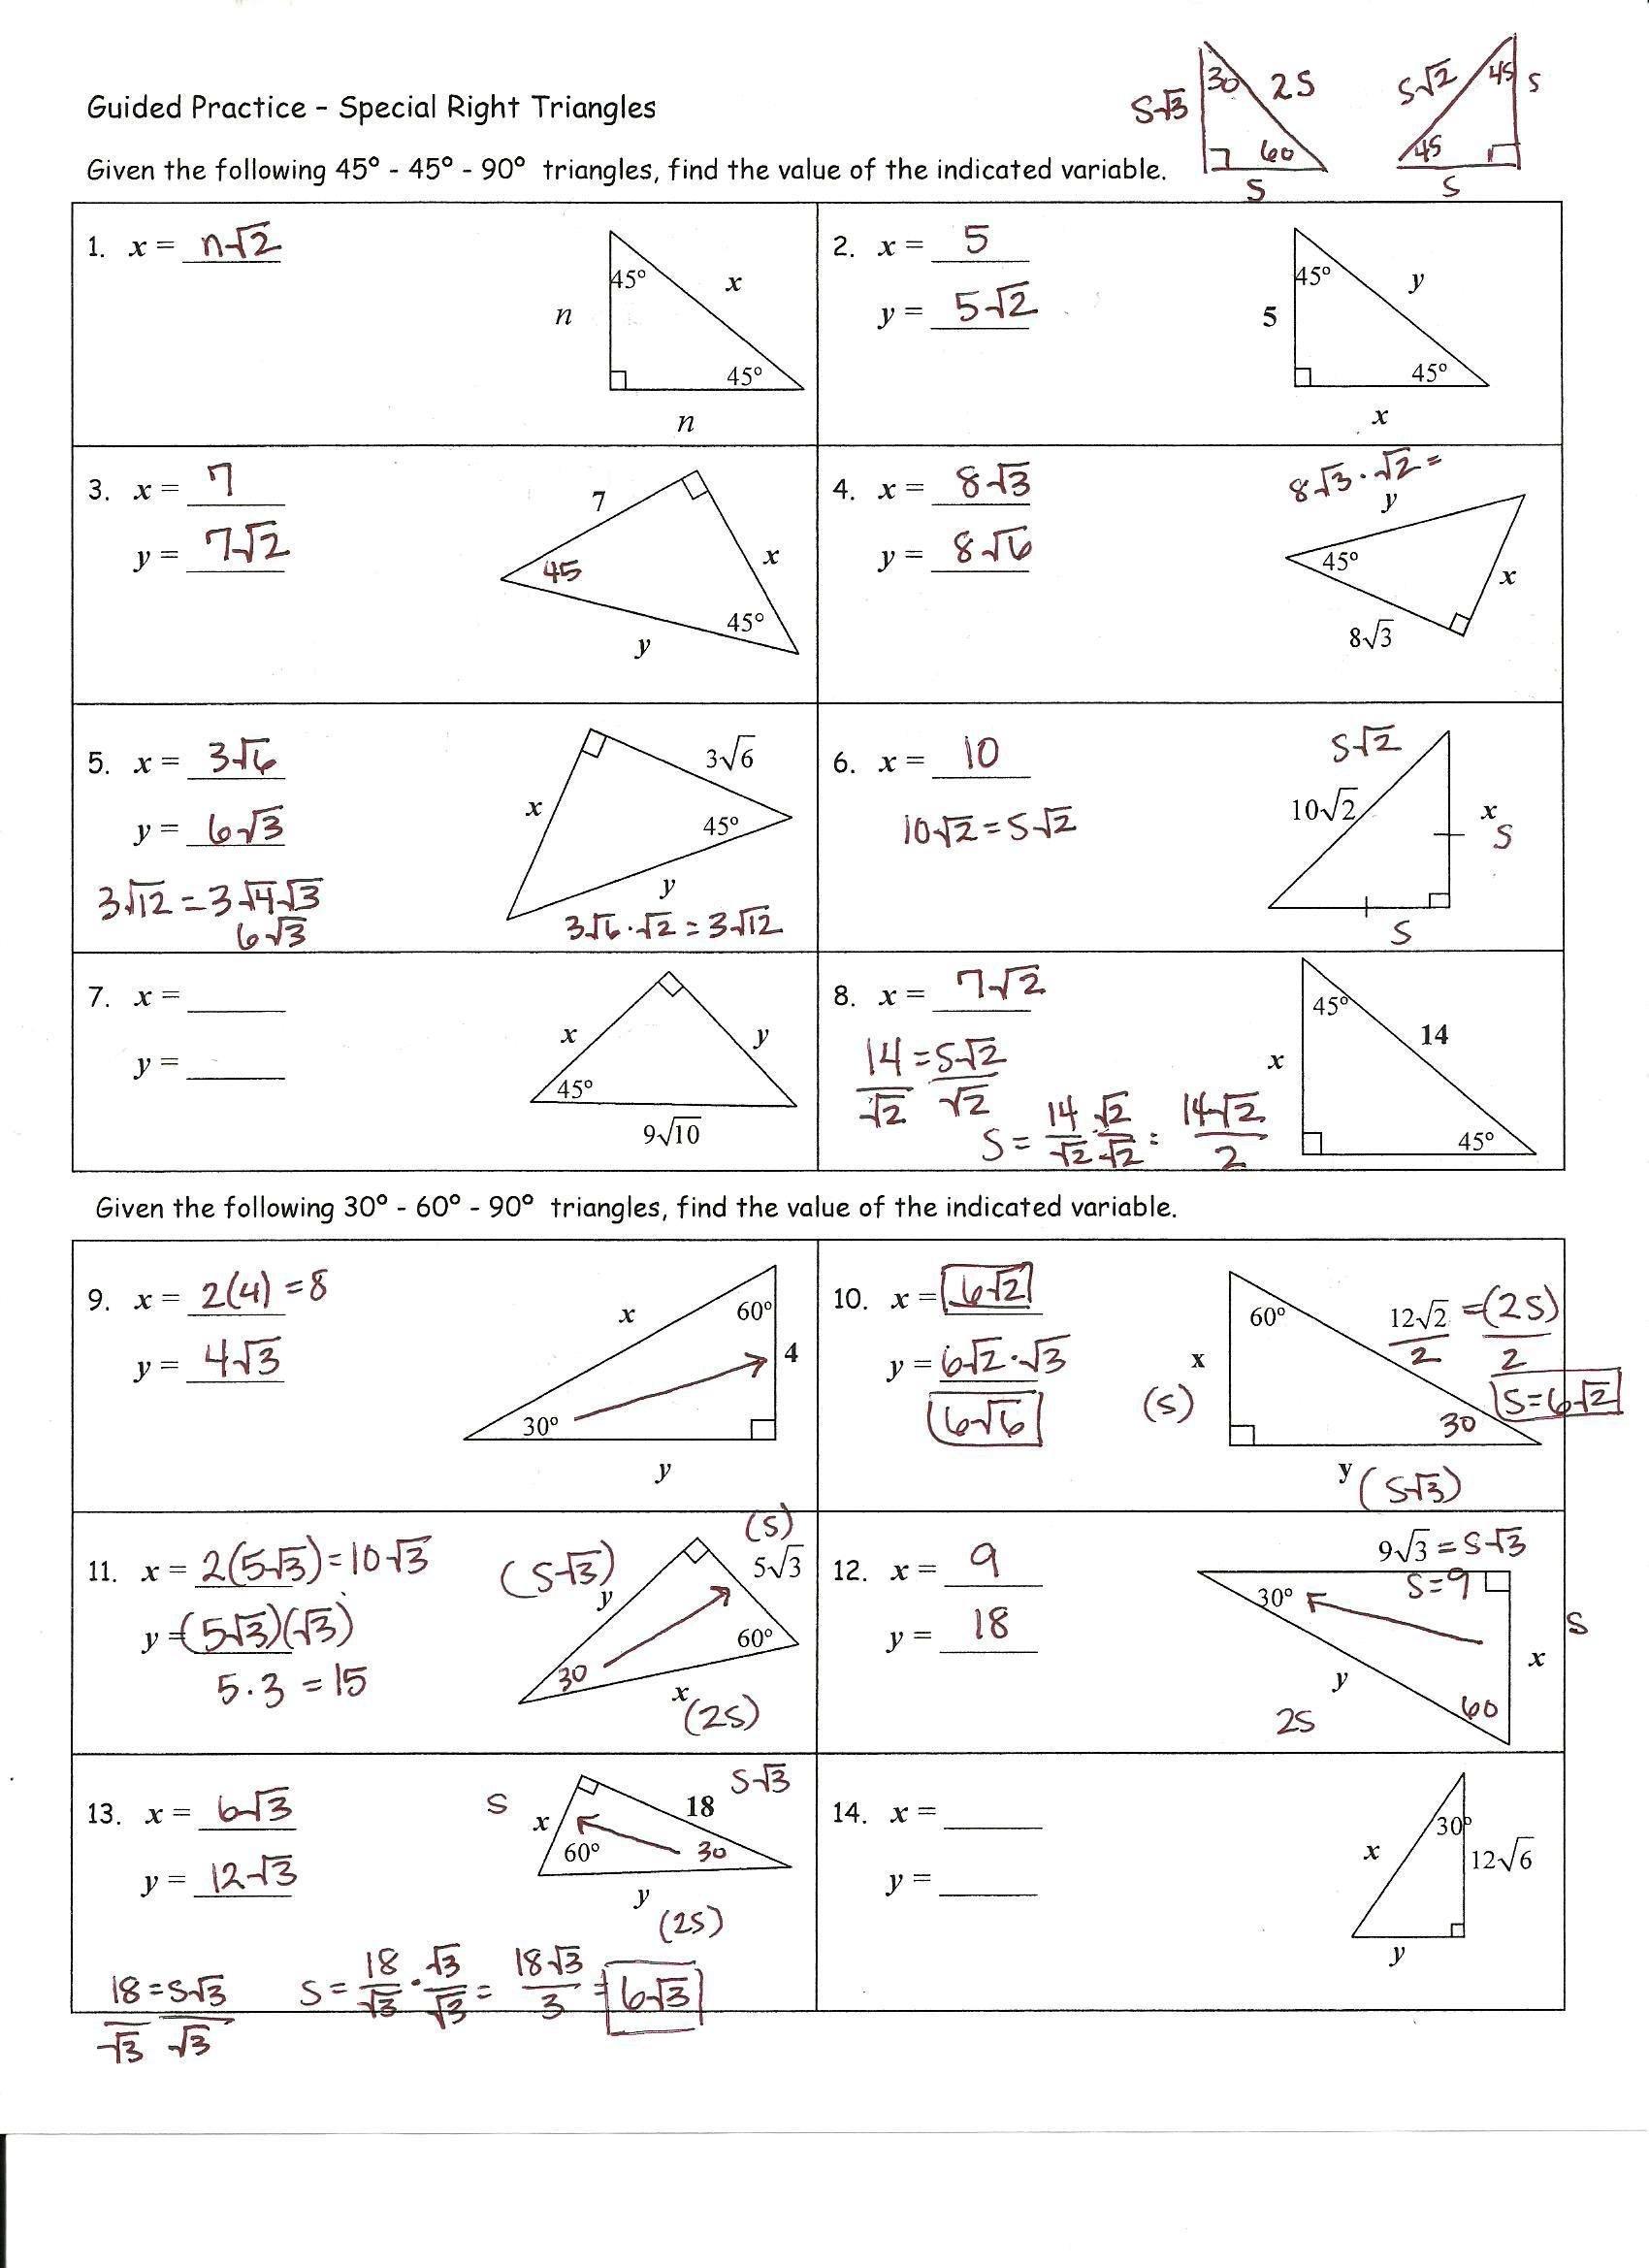 Worksheet Right Triangle Trigonometry Worksheet Trigonometry Intended For Right Triangle Trigonometry Worksheet Answers